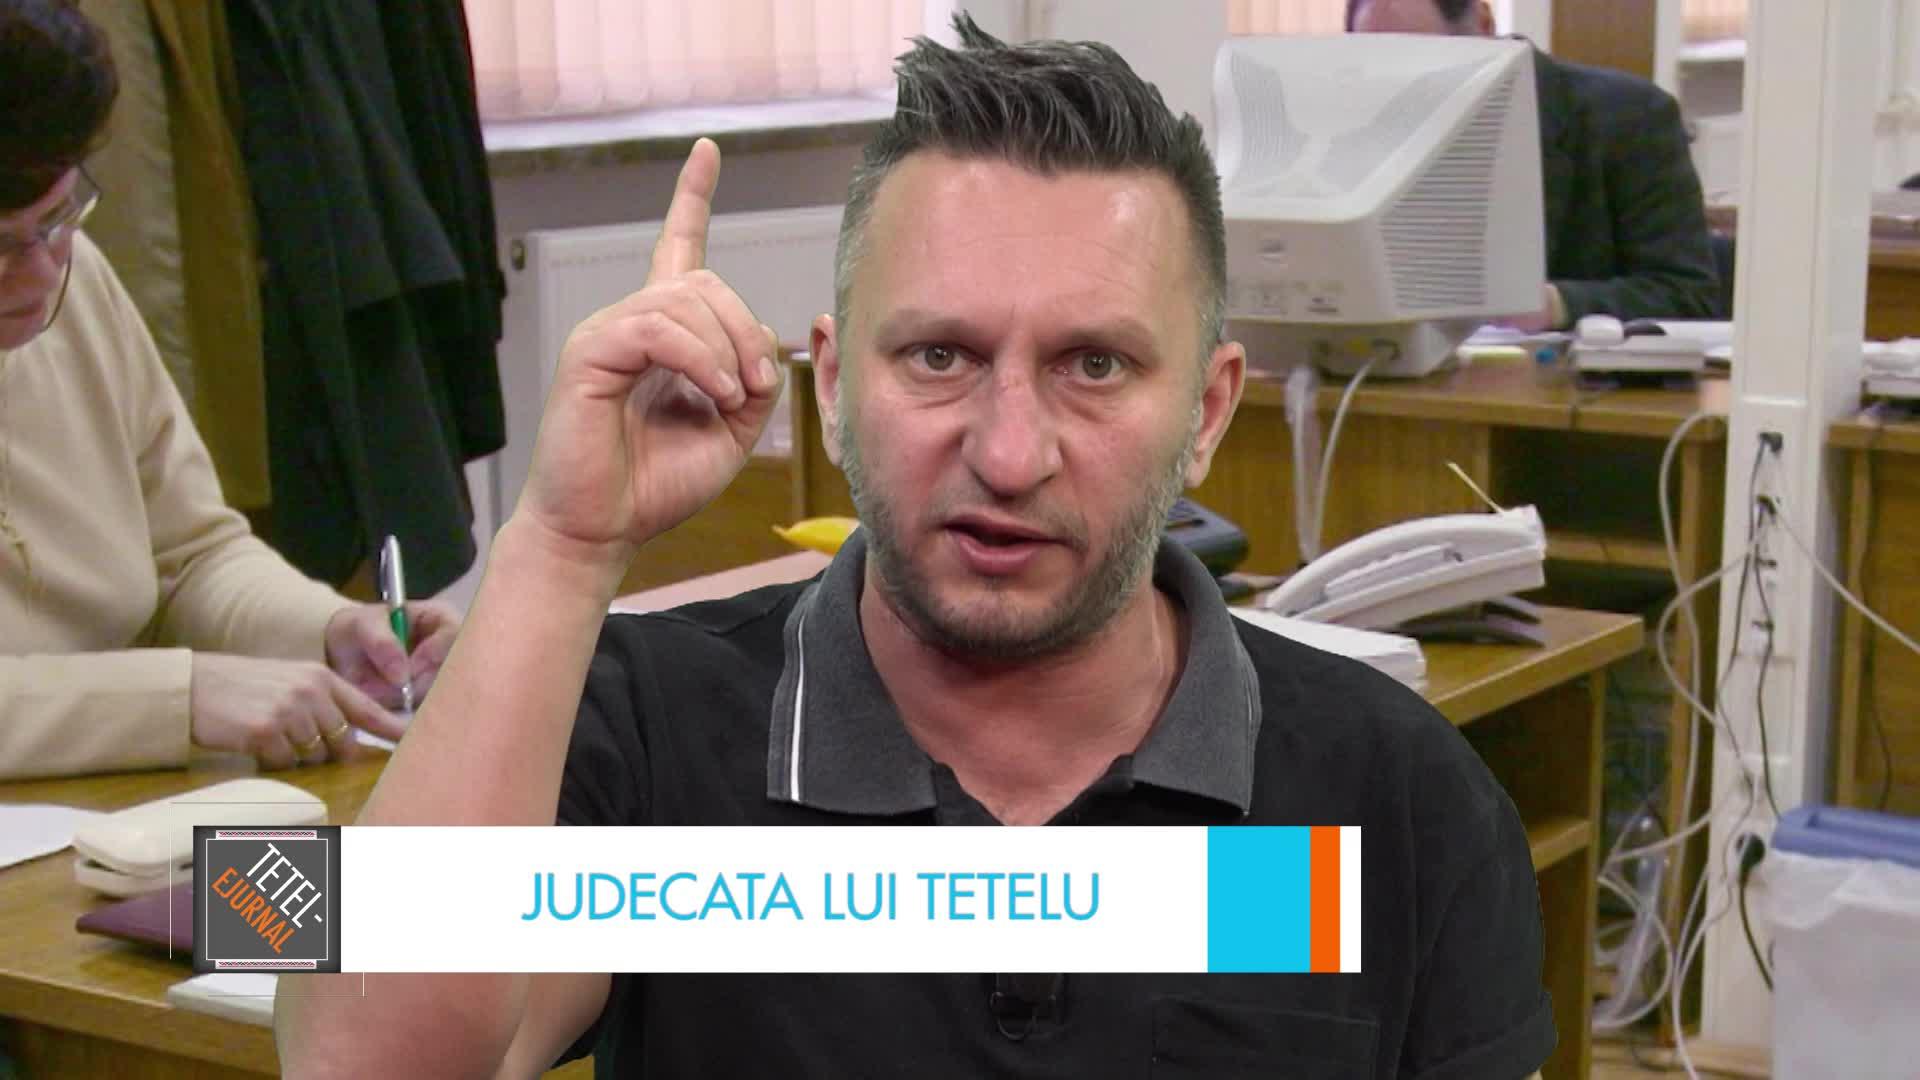 Judecata lui Tetelu: Cum sa stai degeaba cu stil